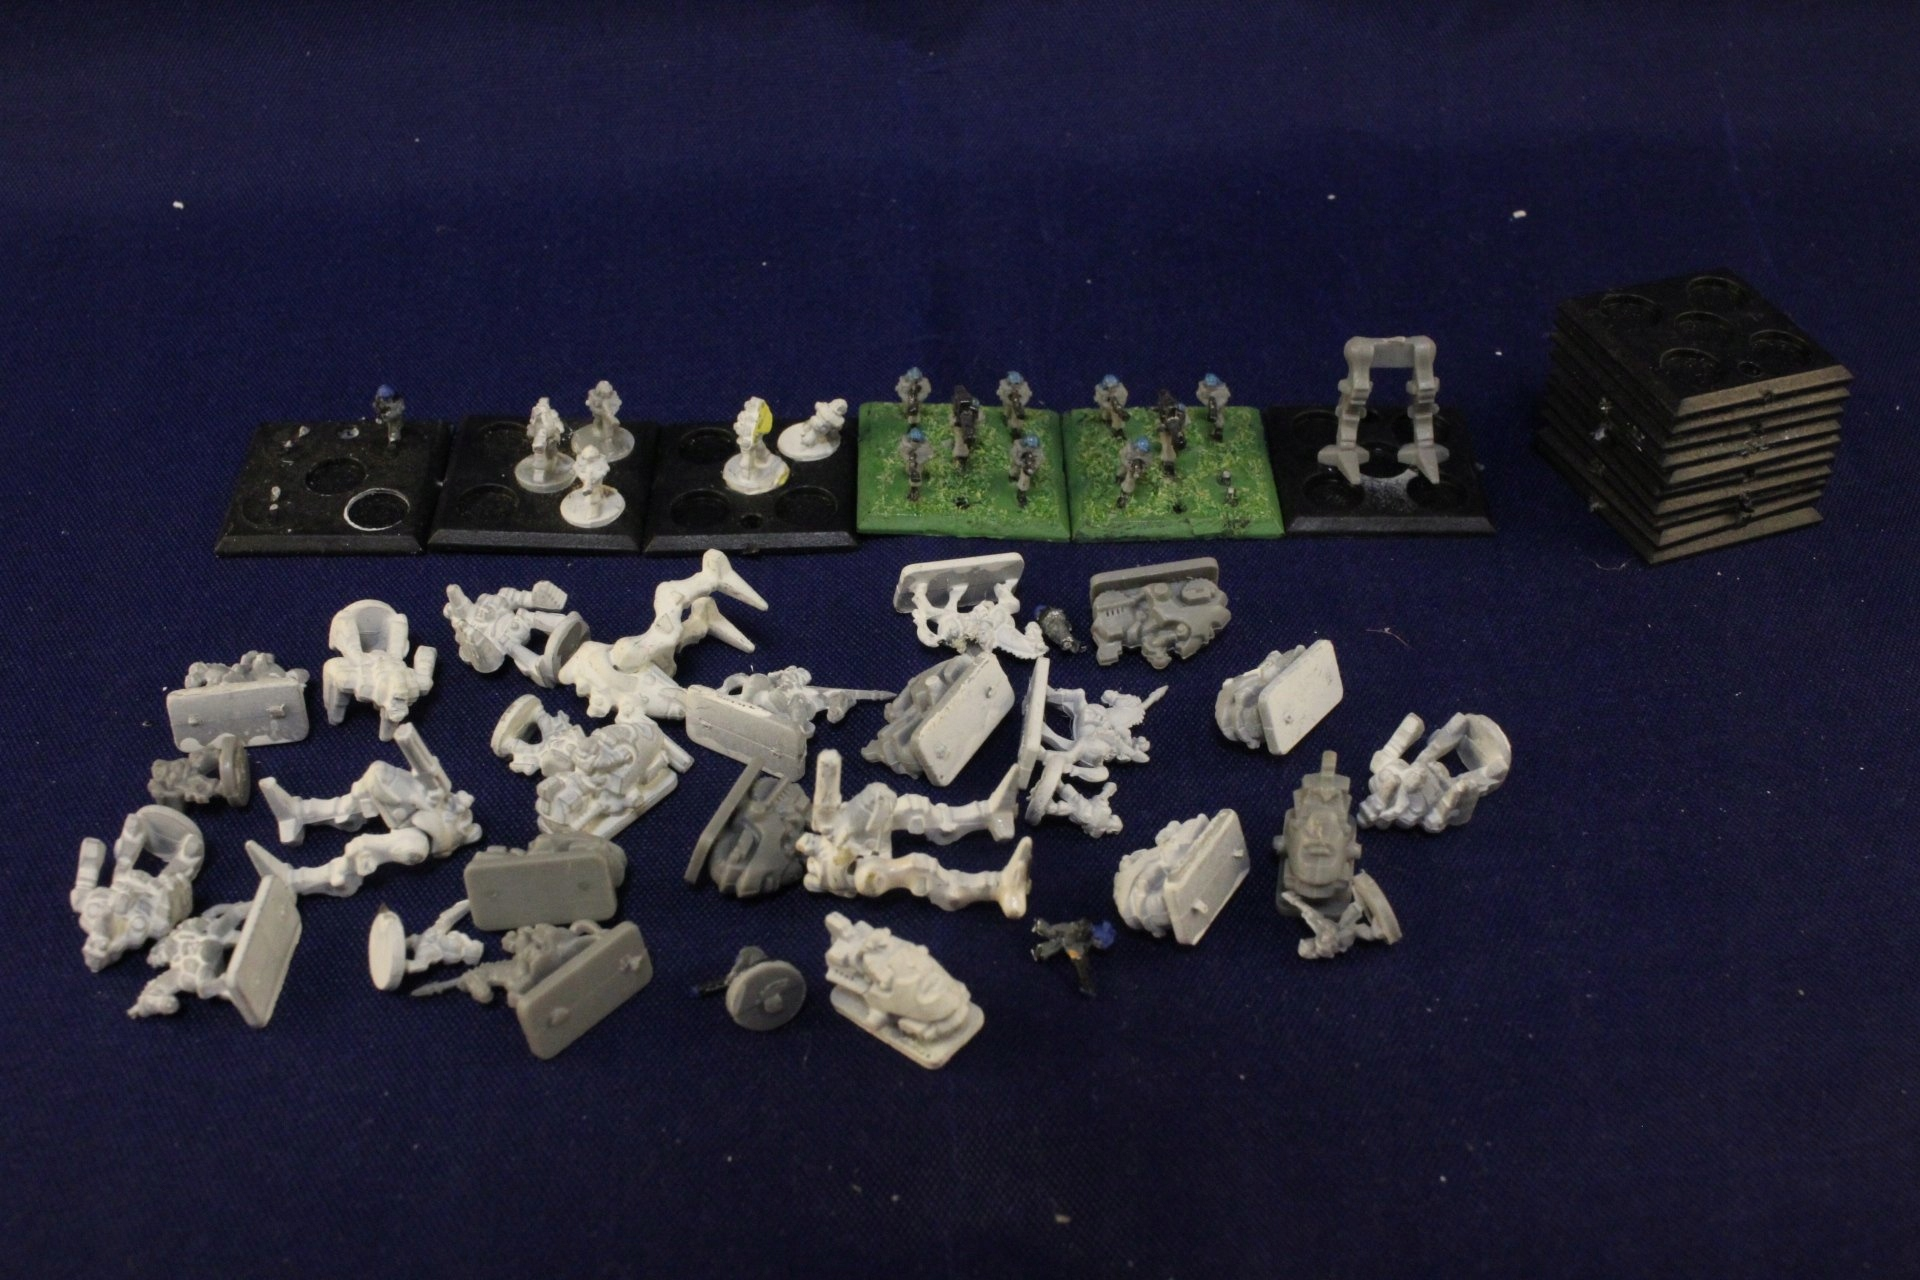 Epic 40k Imperial Guard zestaw figurek n3176 - 6710542532